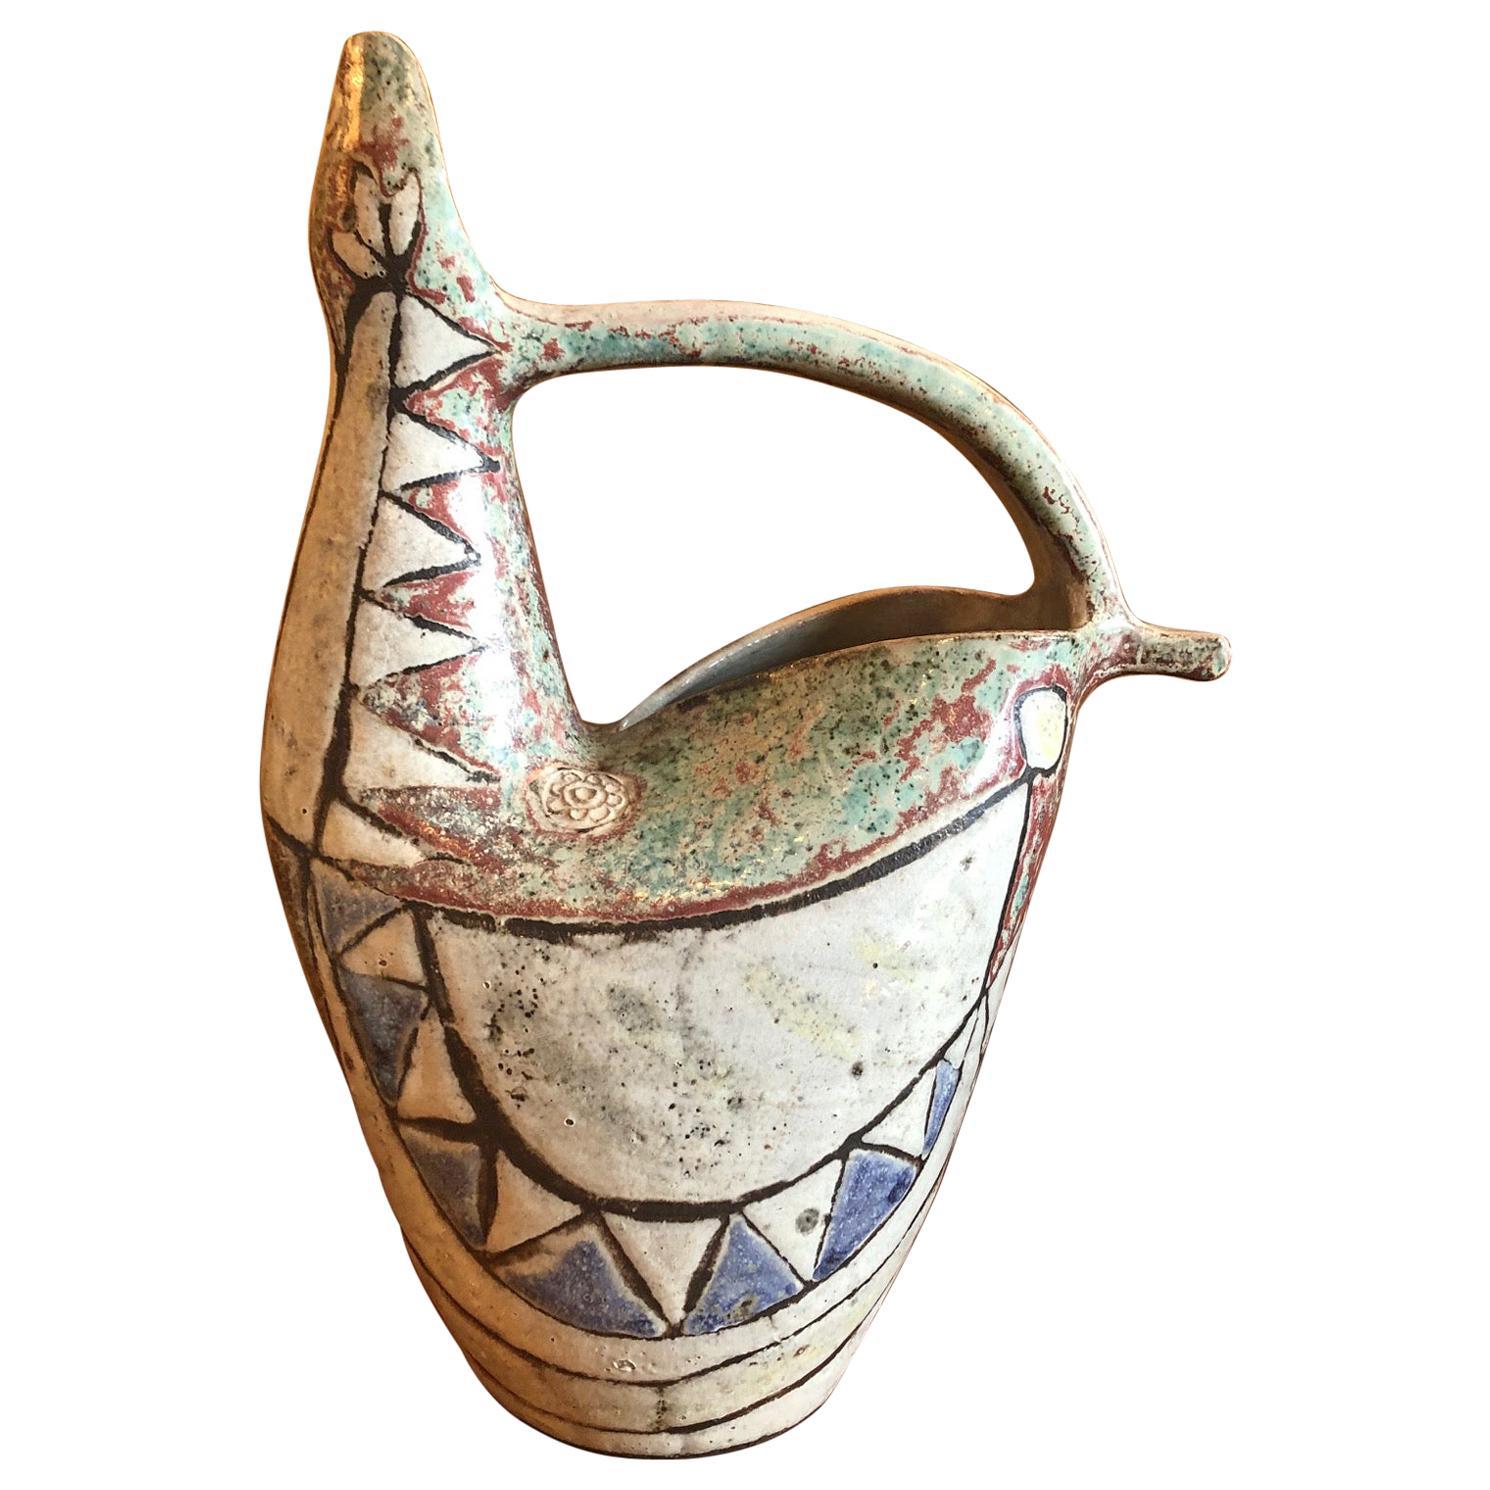 Ceramic Vase by Jean Derval / Vallauris, France, 1960s